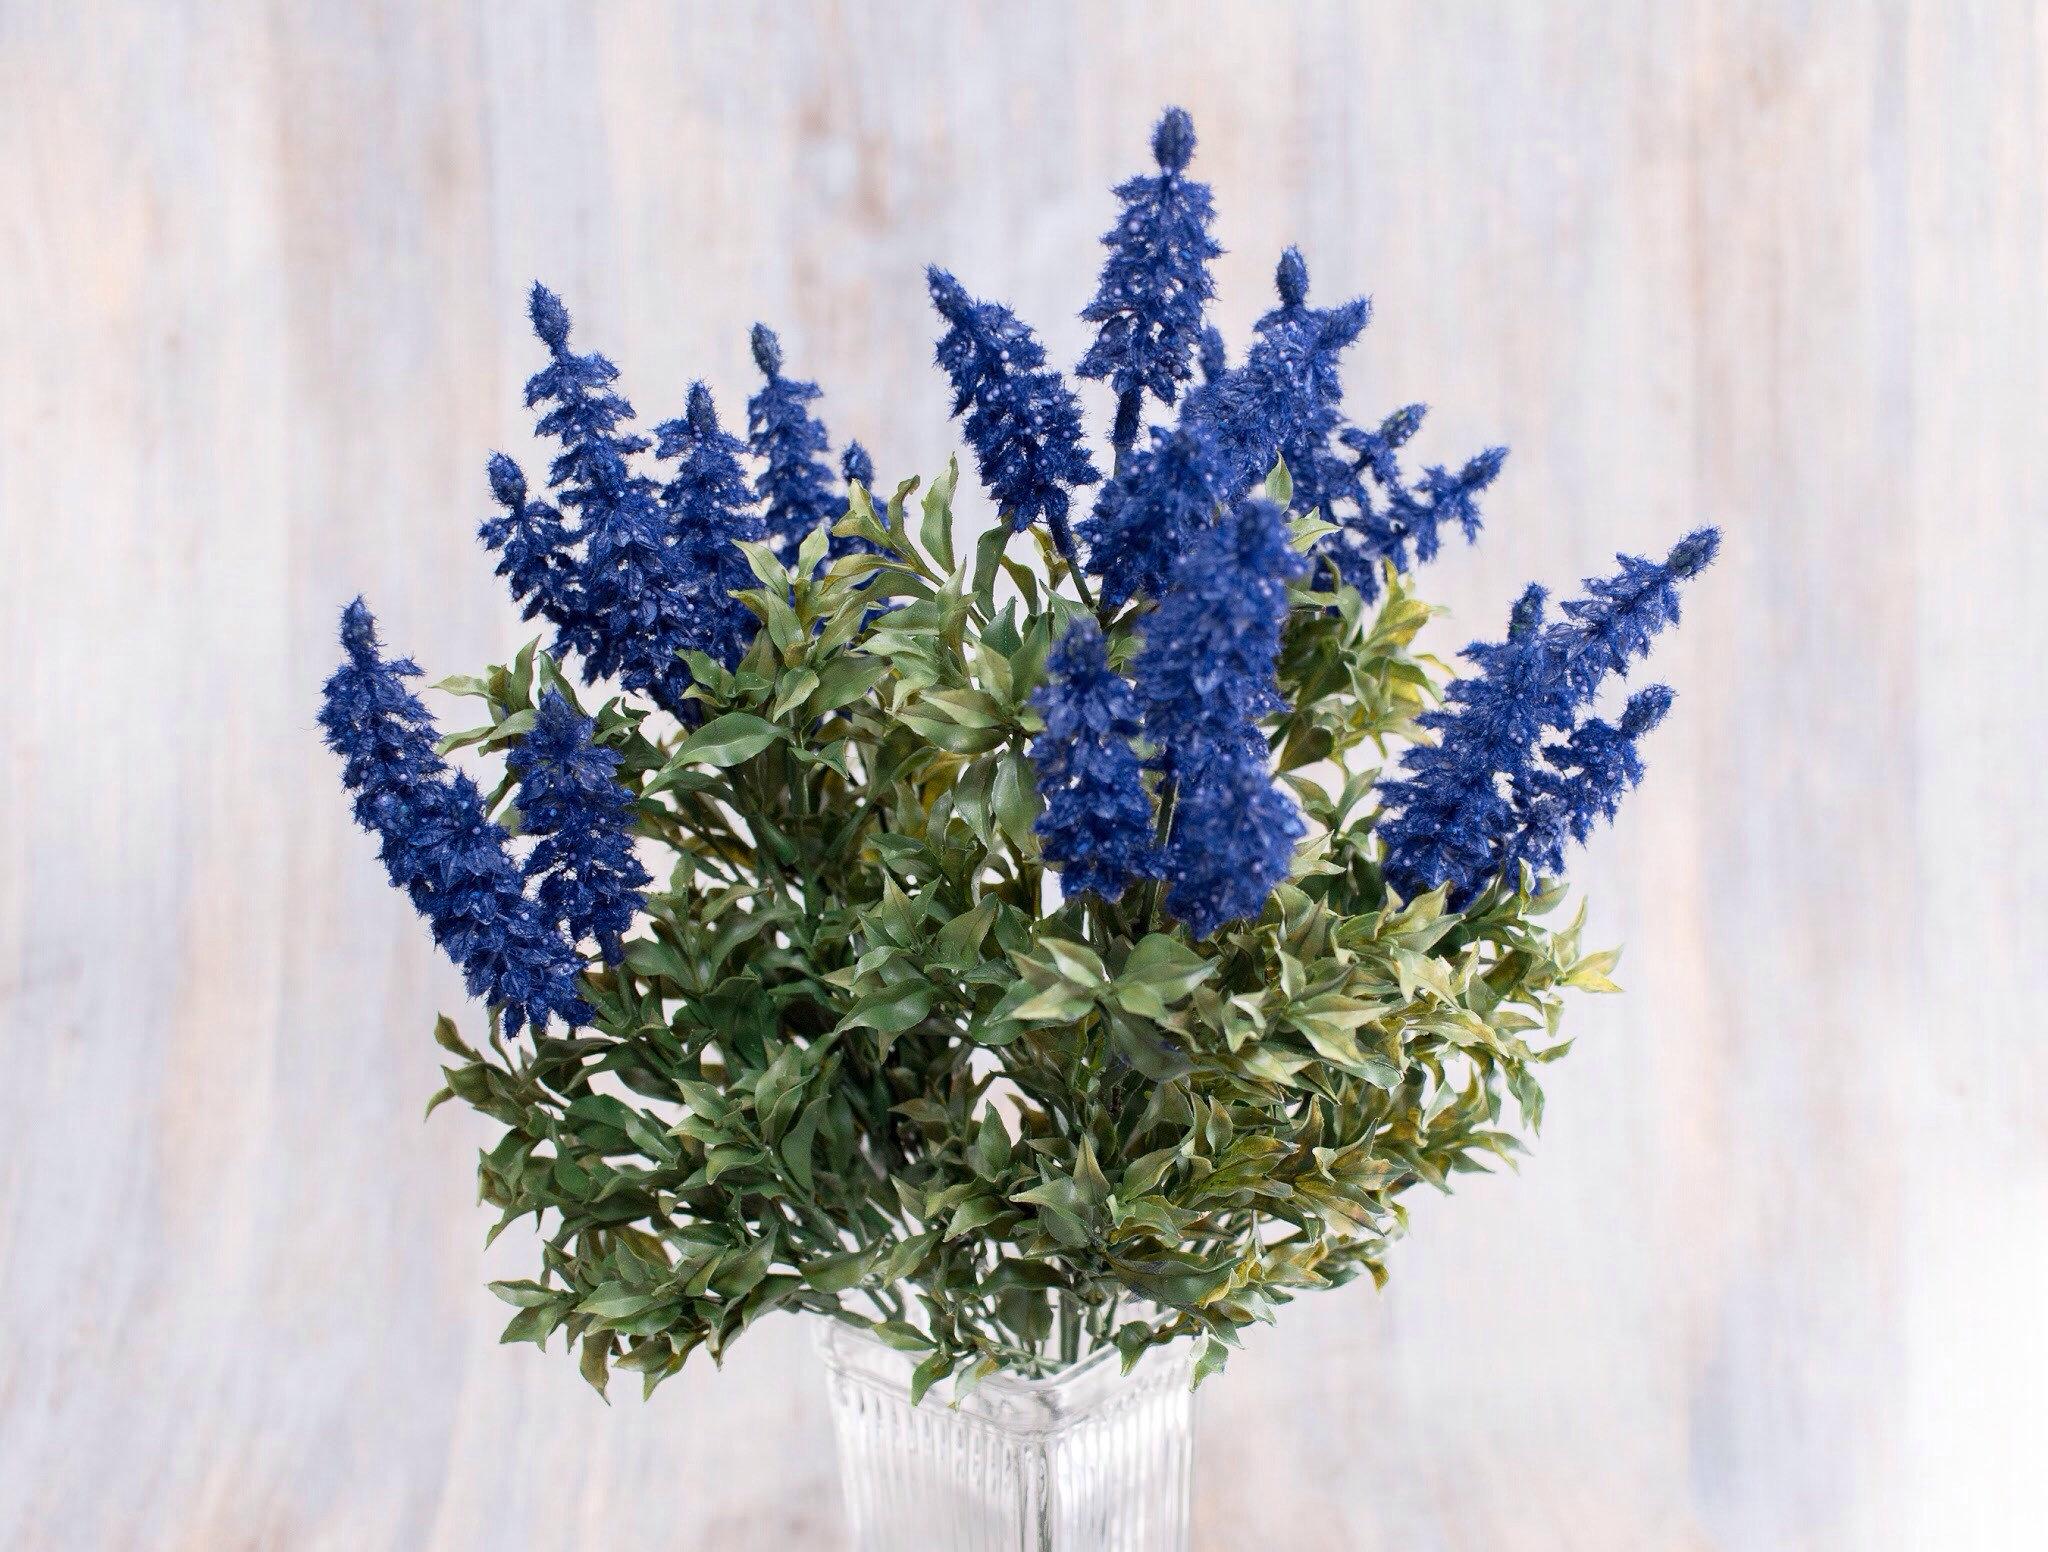 23612 Pcs 20 Blue Wild Stock Wild Flower Bush Artificial